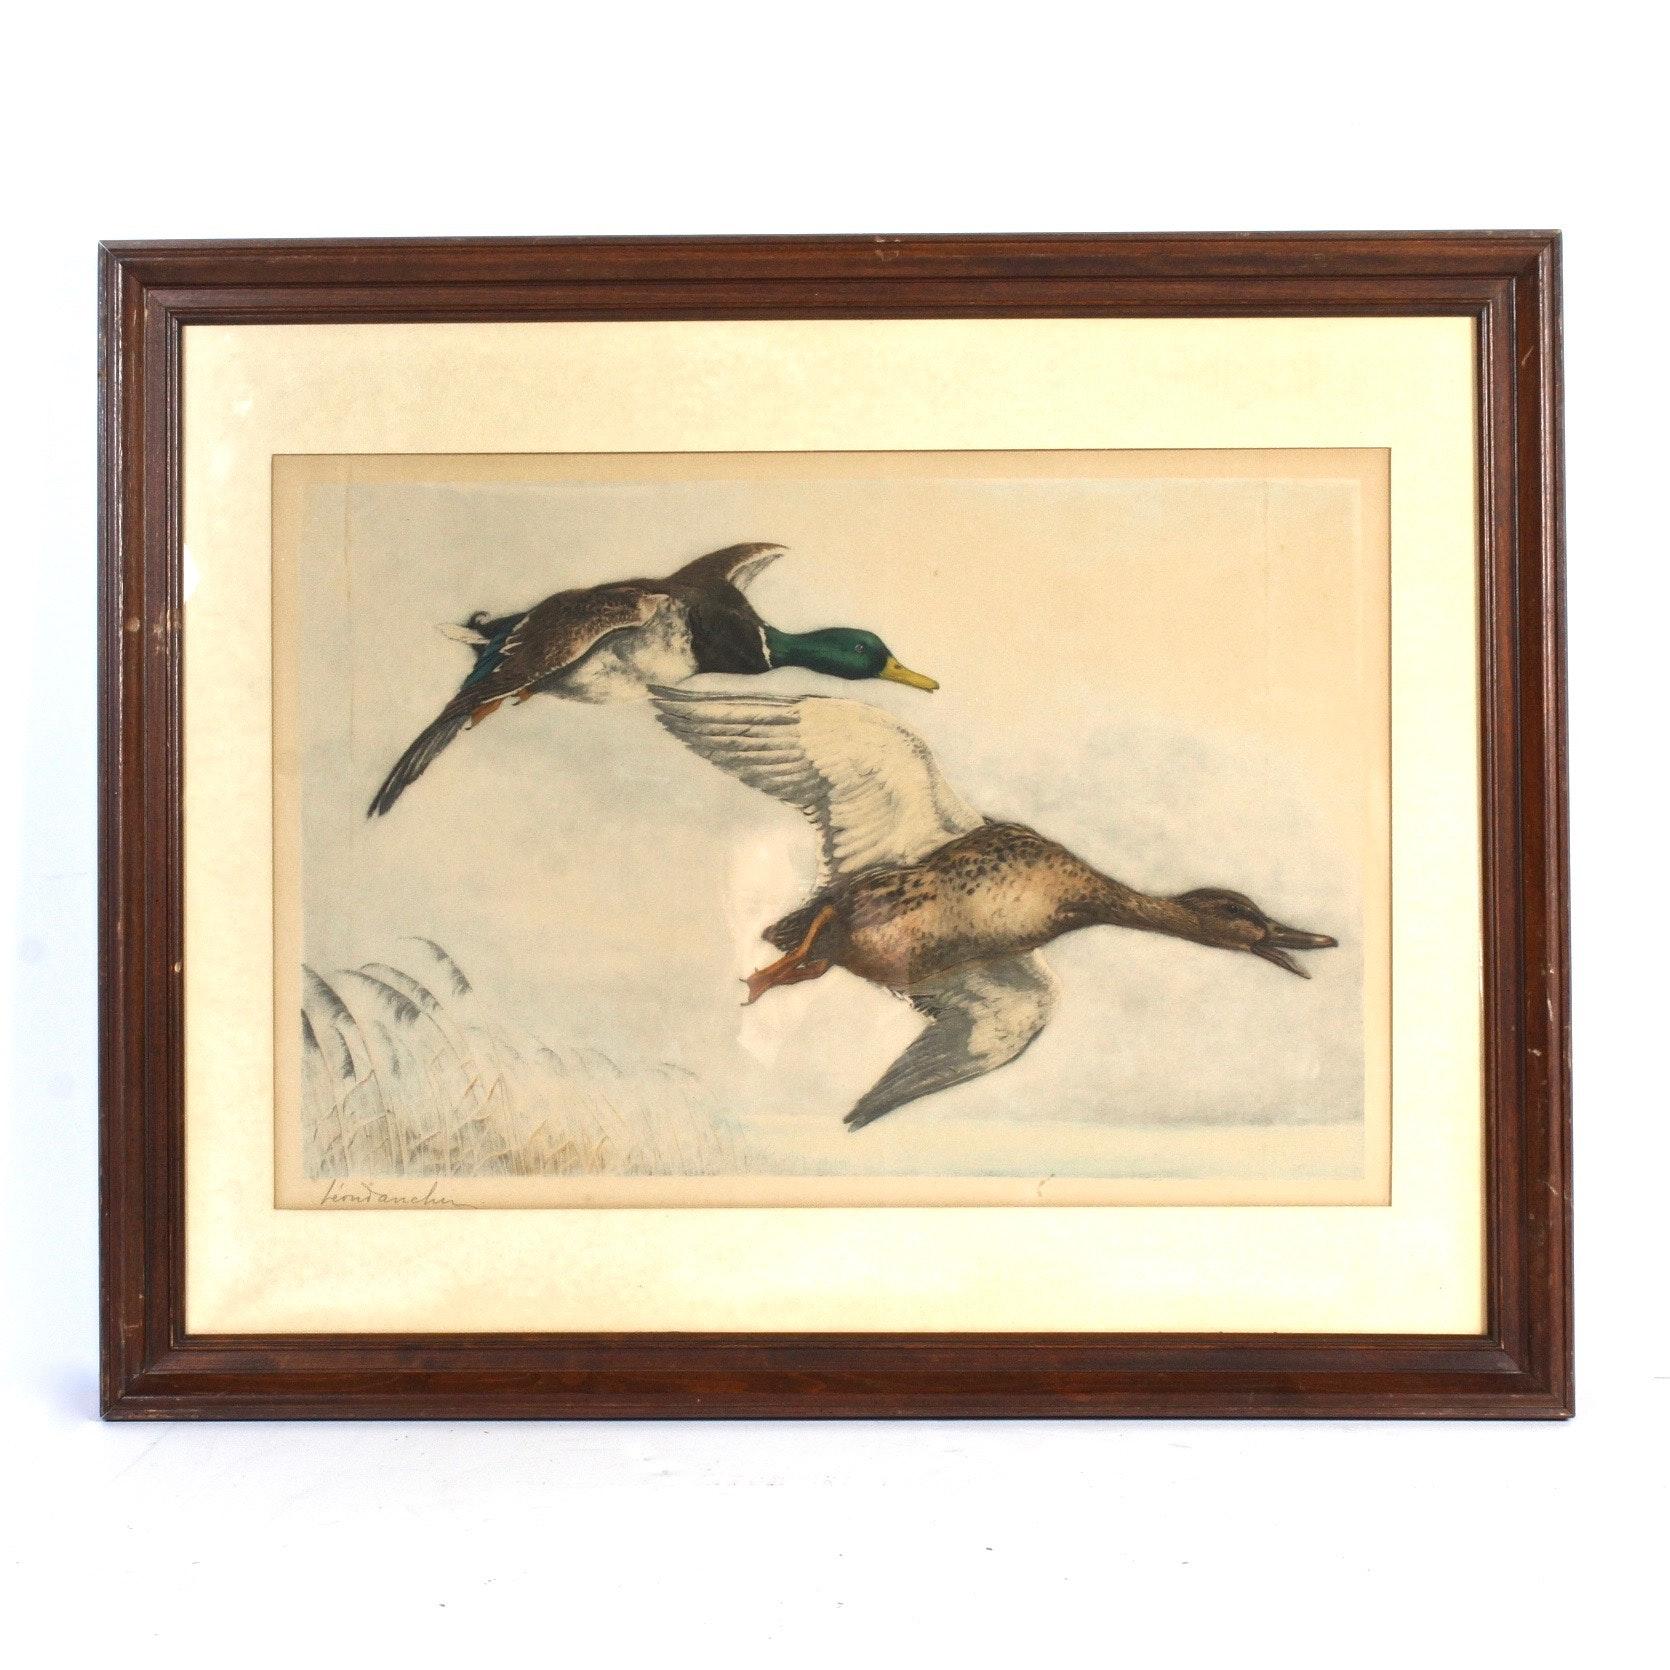 Leon Danchin Chromolithograph with Ducks in Flight